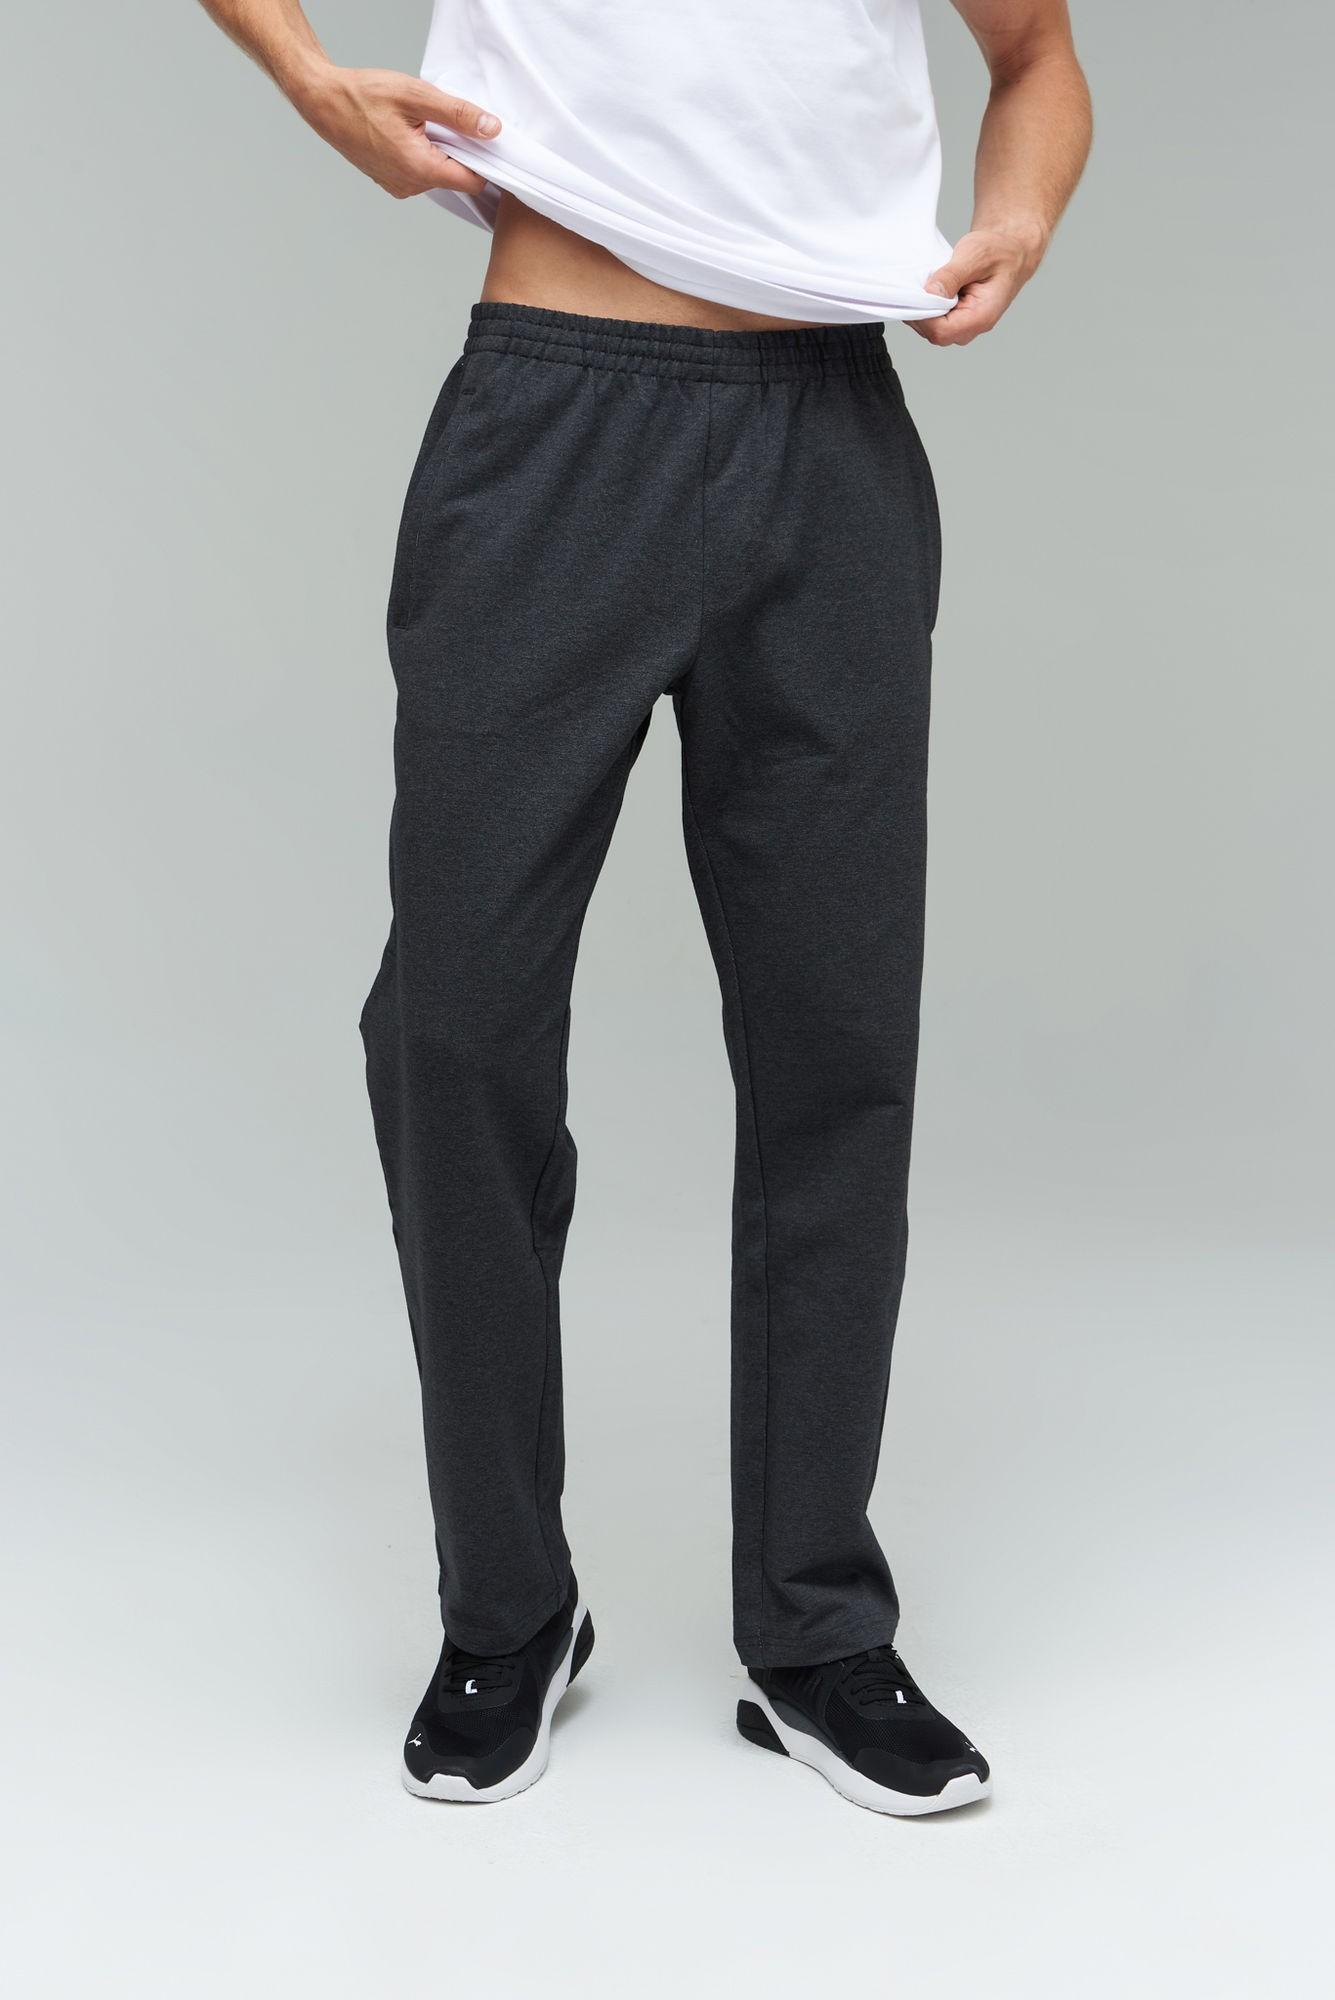 AUDIMAS Laisvo sil. tamprios medv. kelnės 1921-459 Dark Grey Melange 184/XL